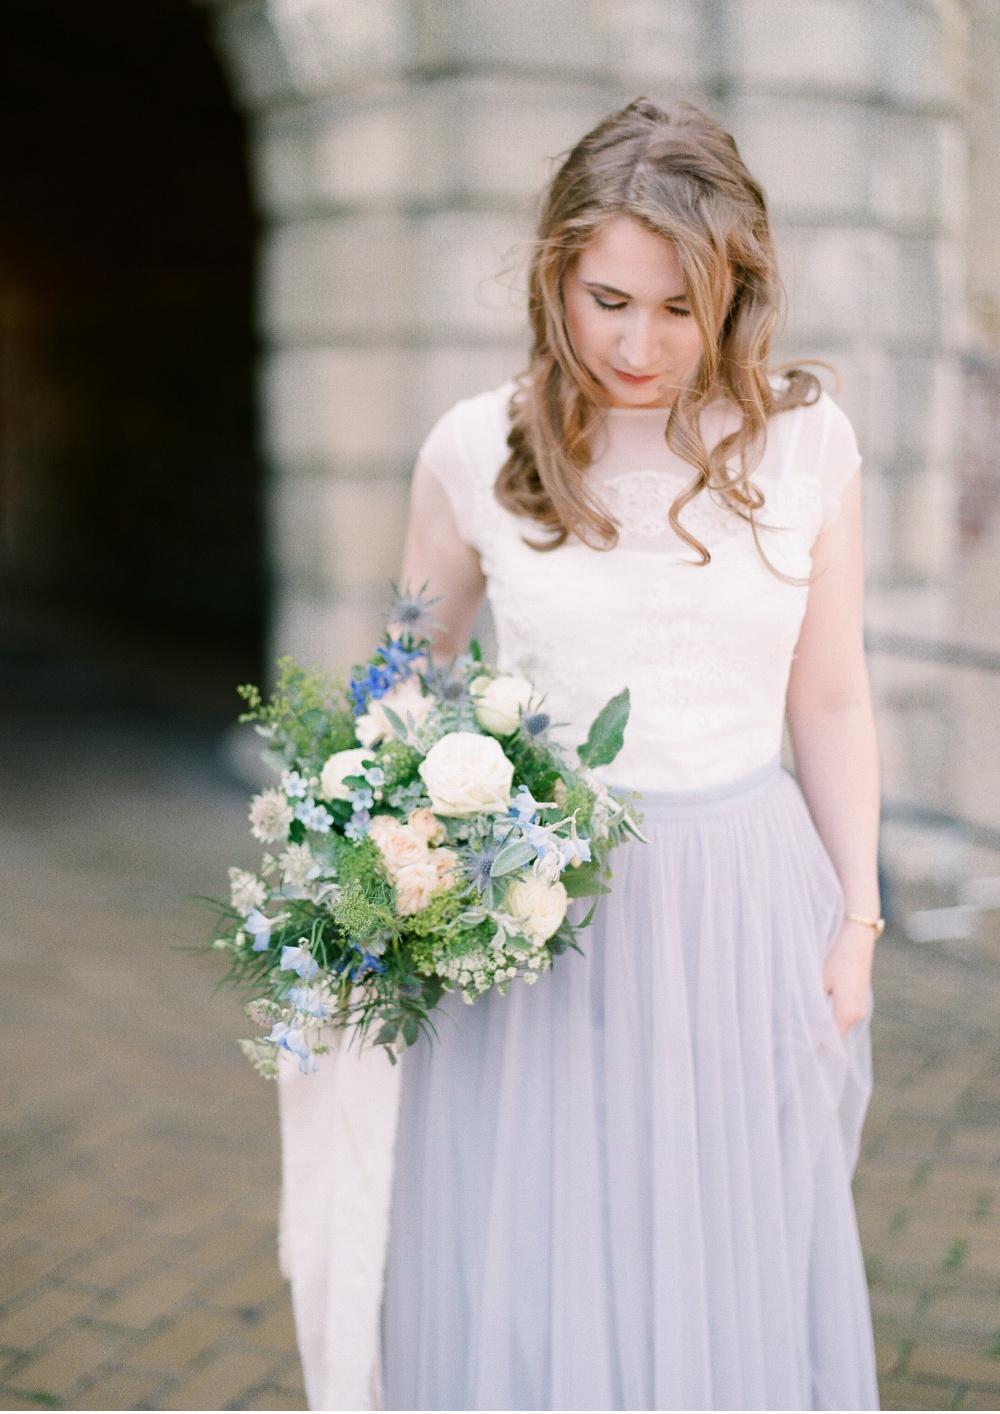 NRW_Hochzeitsfotograf©MadalinaSheldon_0001.jpg